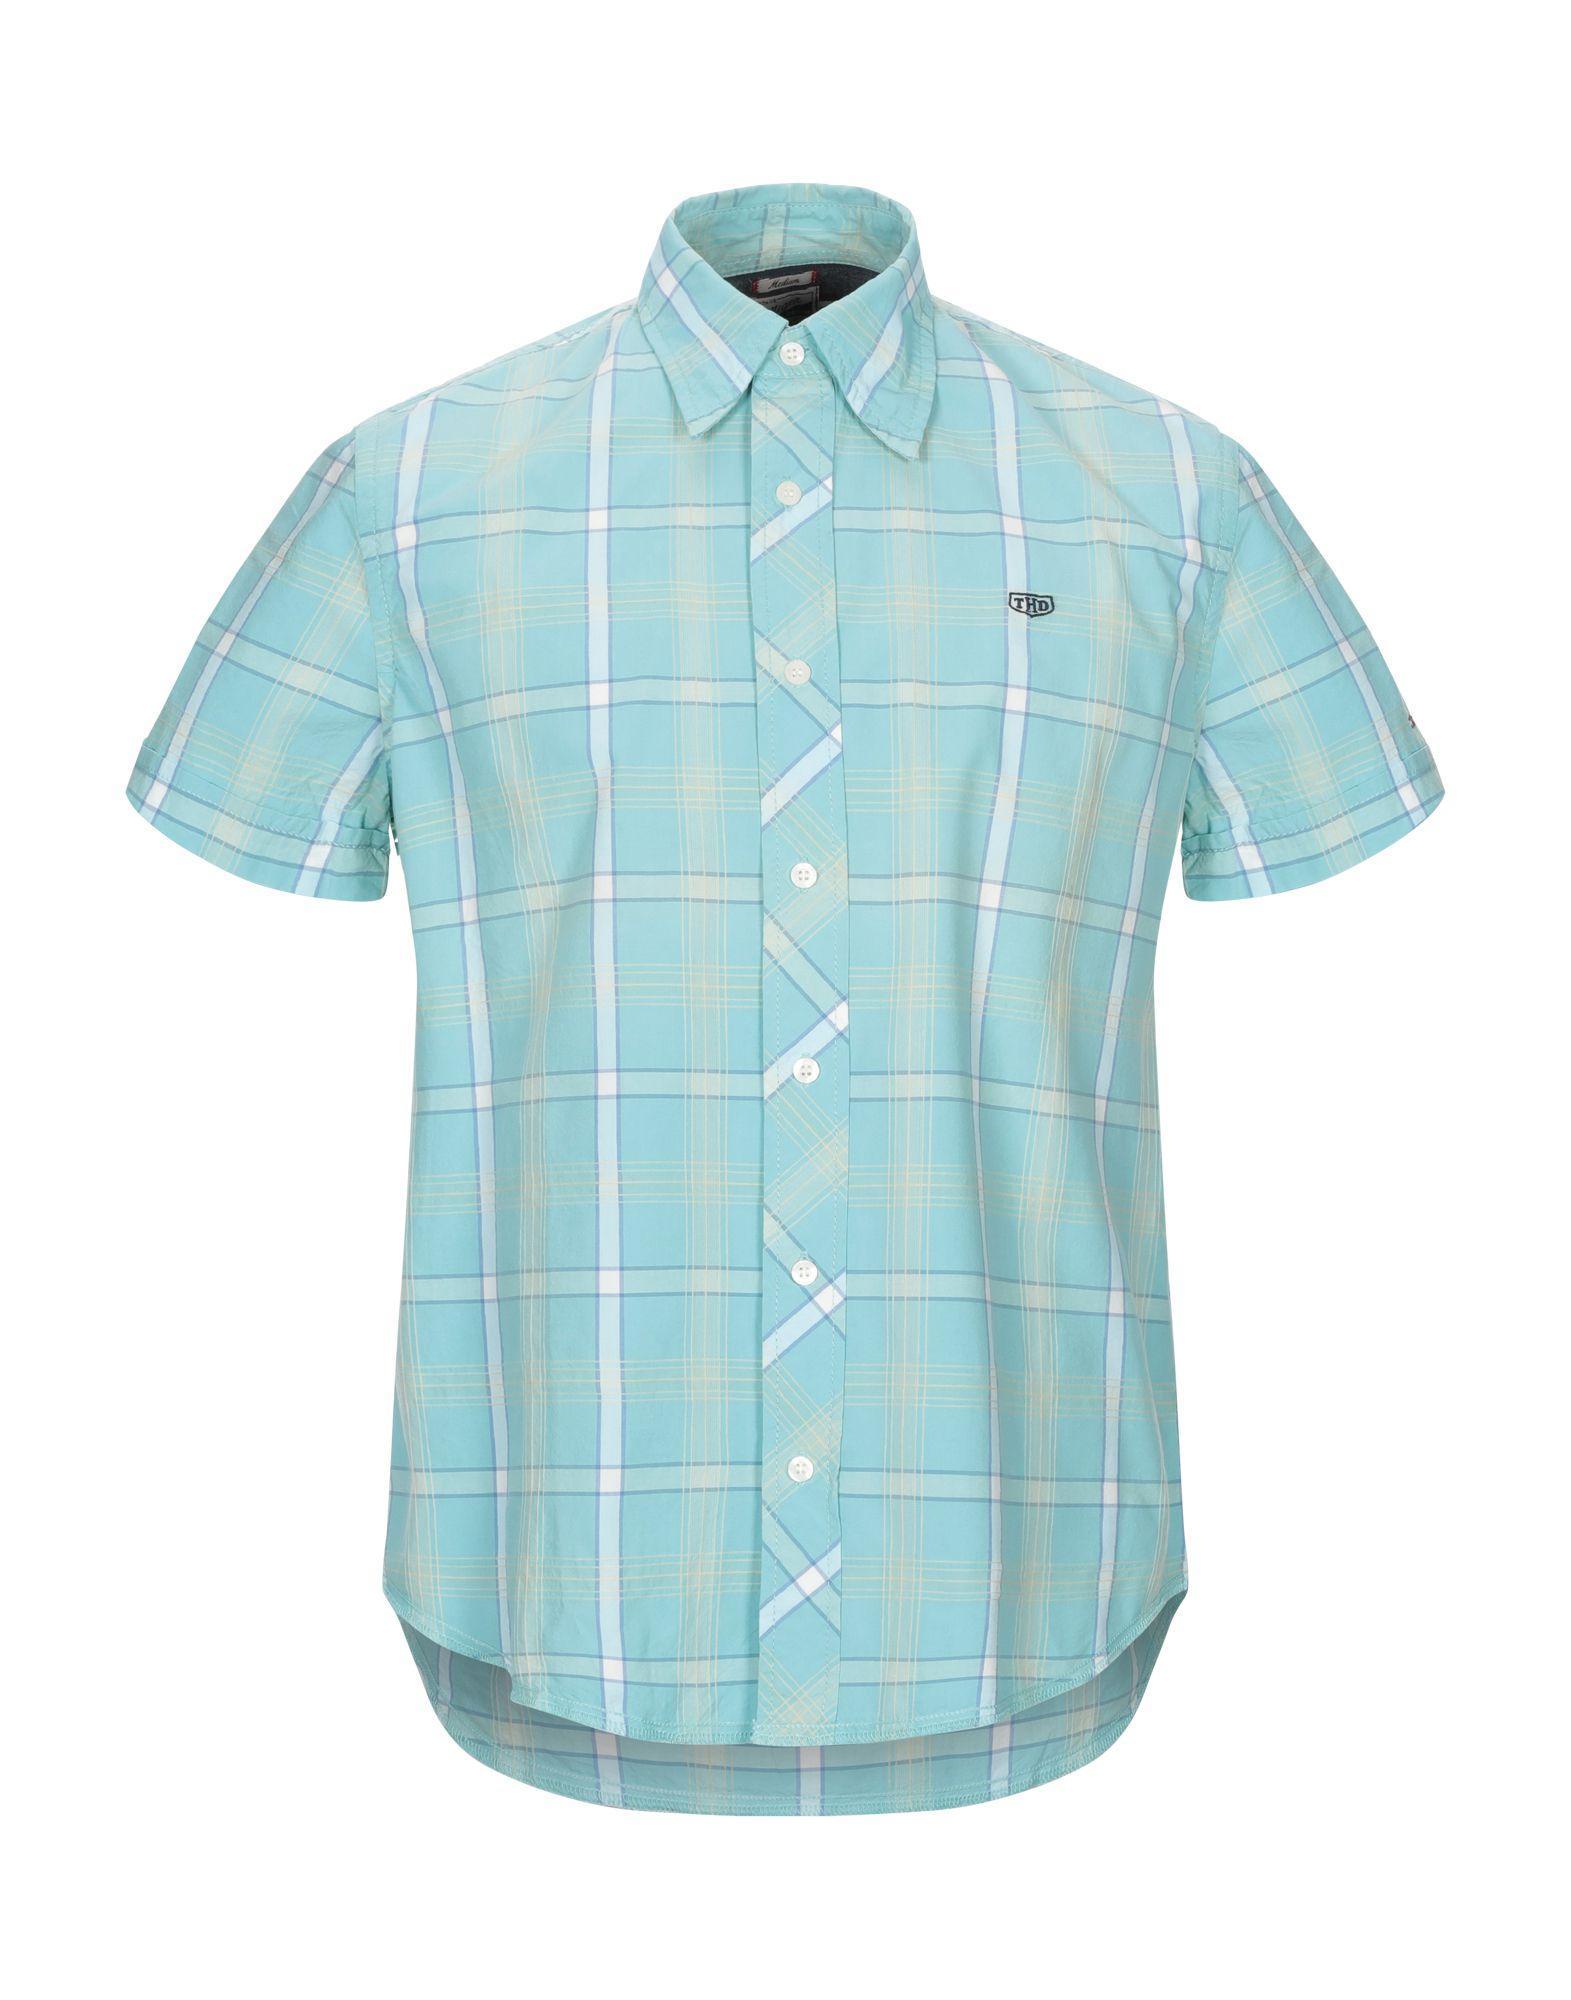 39928b08 Lyst - Tommy Hilfiger Shirt in Blue for Men